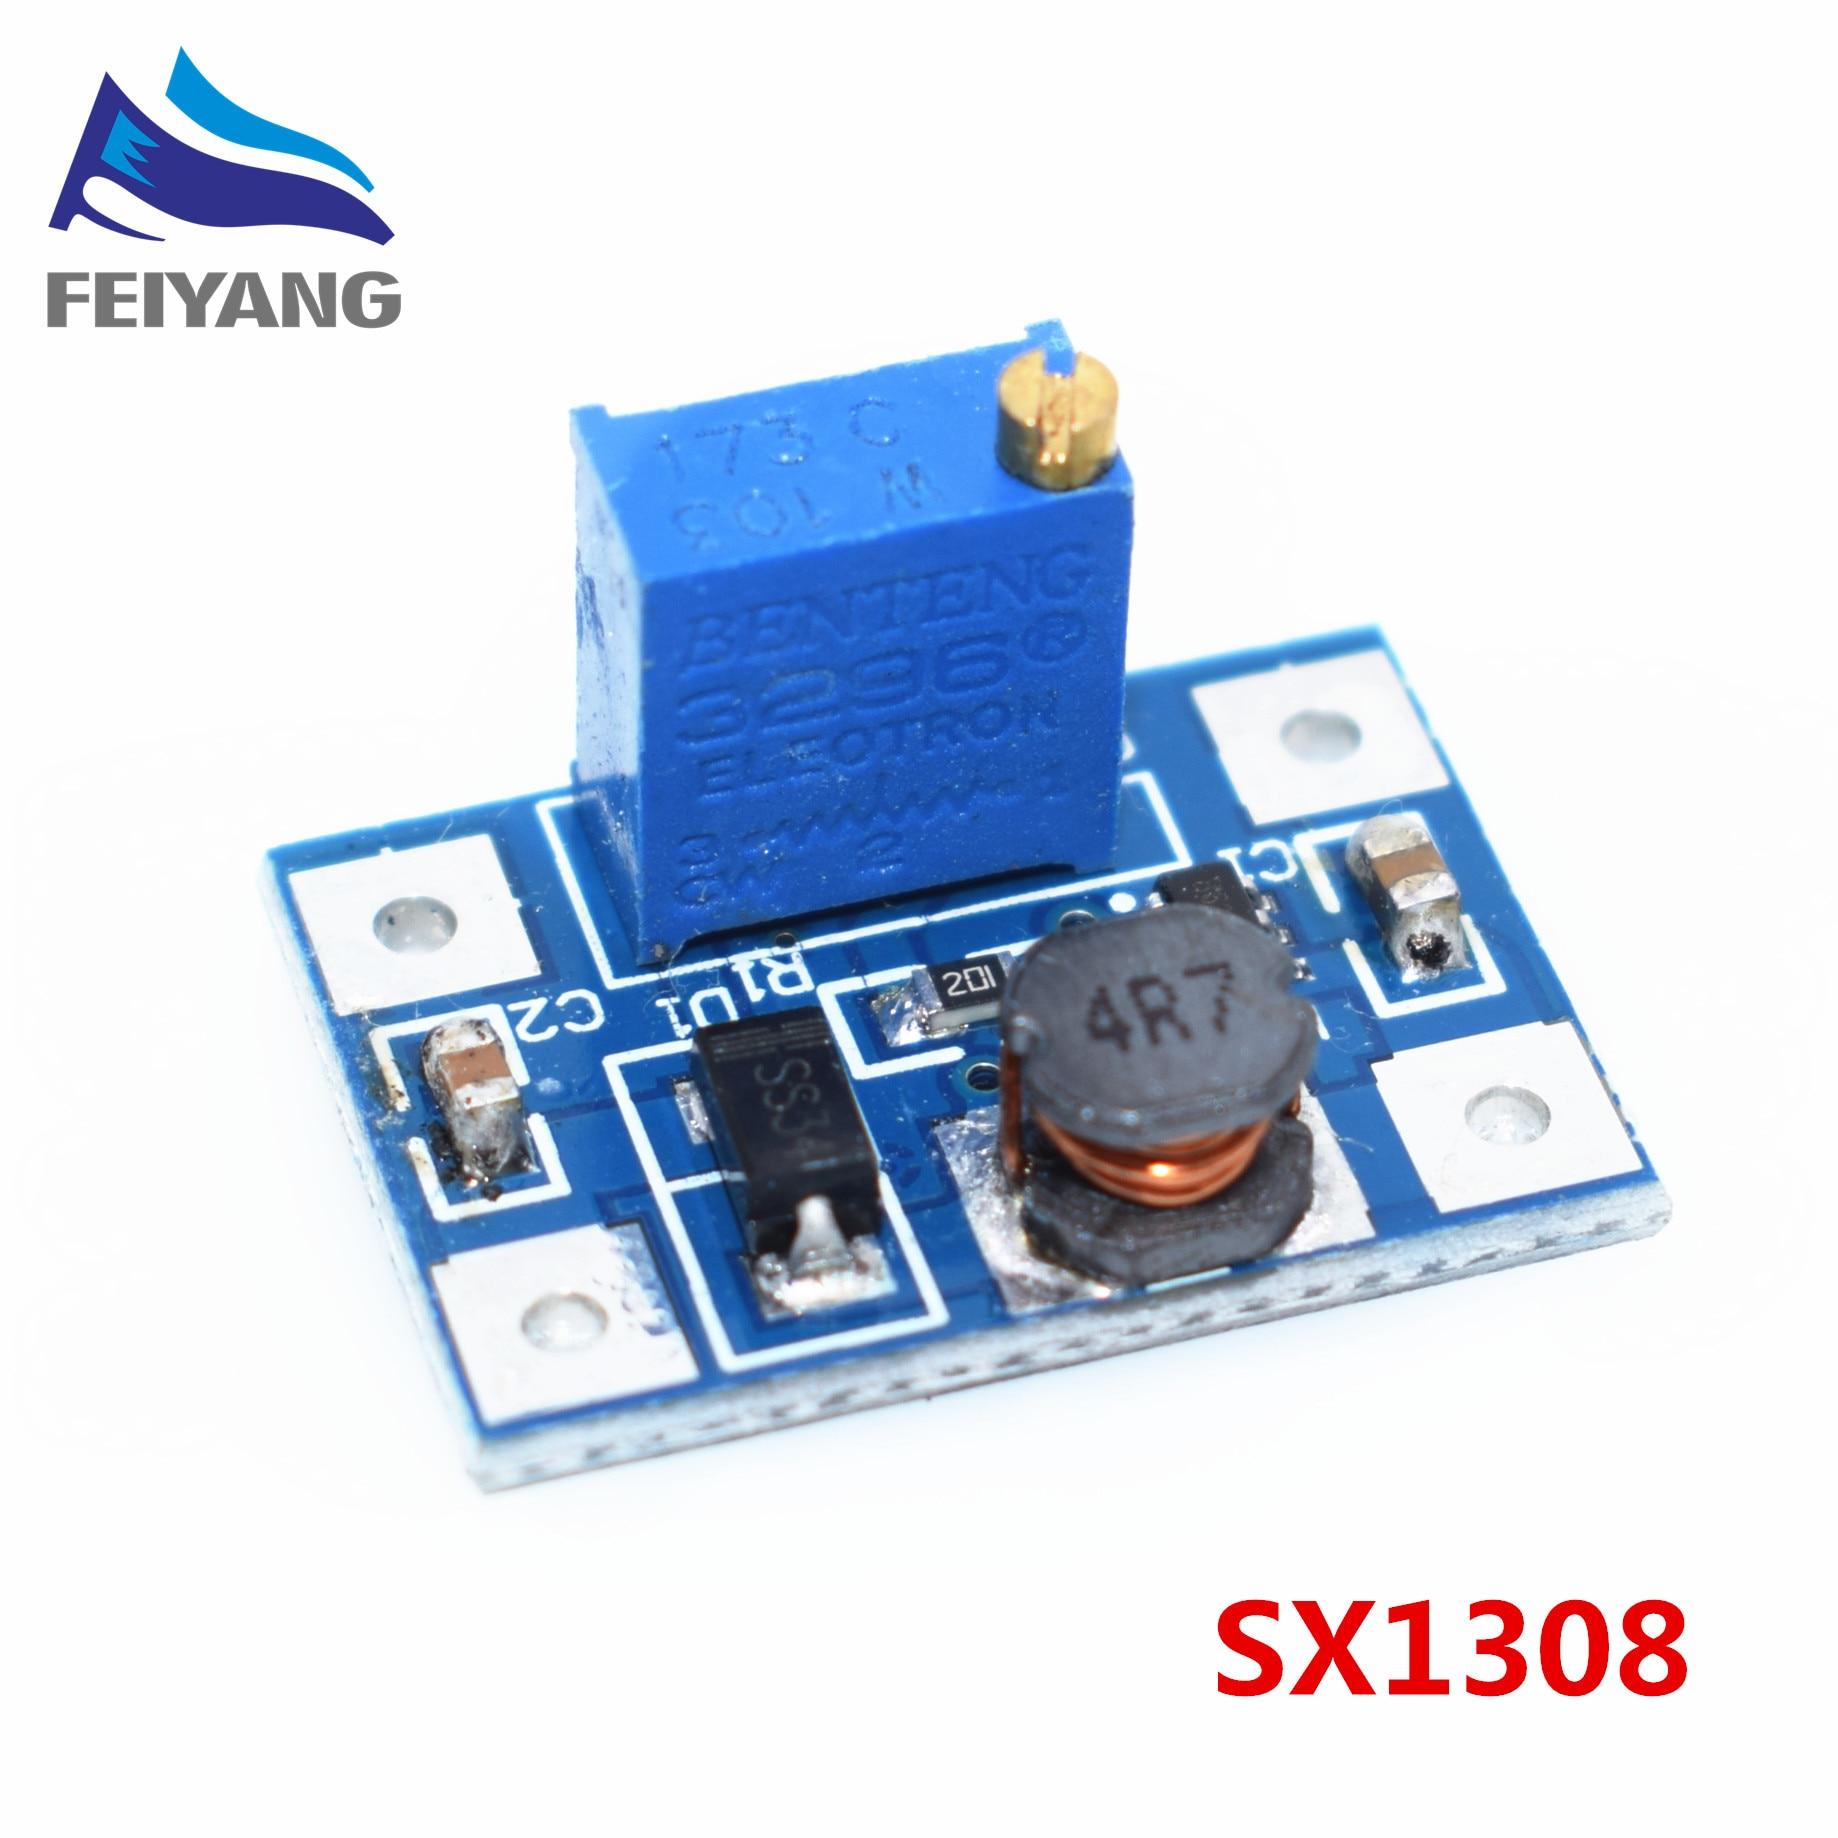 100pcs Smart Electronics DC-DC SX1308 Step-UP Adjustable Power Module Step Up Boost Converter 2-24V to 2-28V 2A